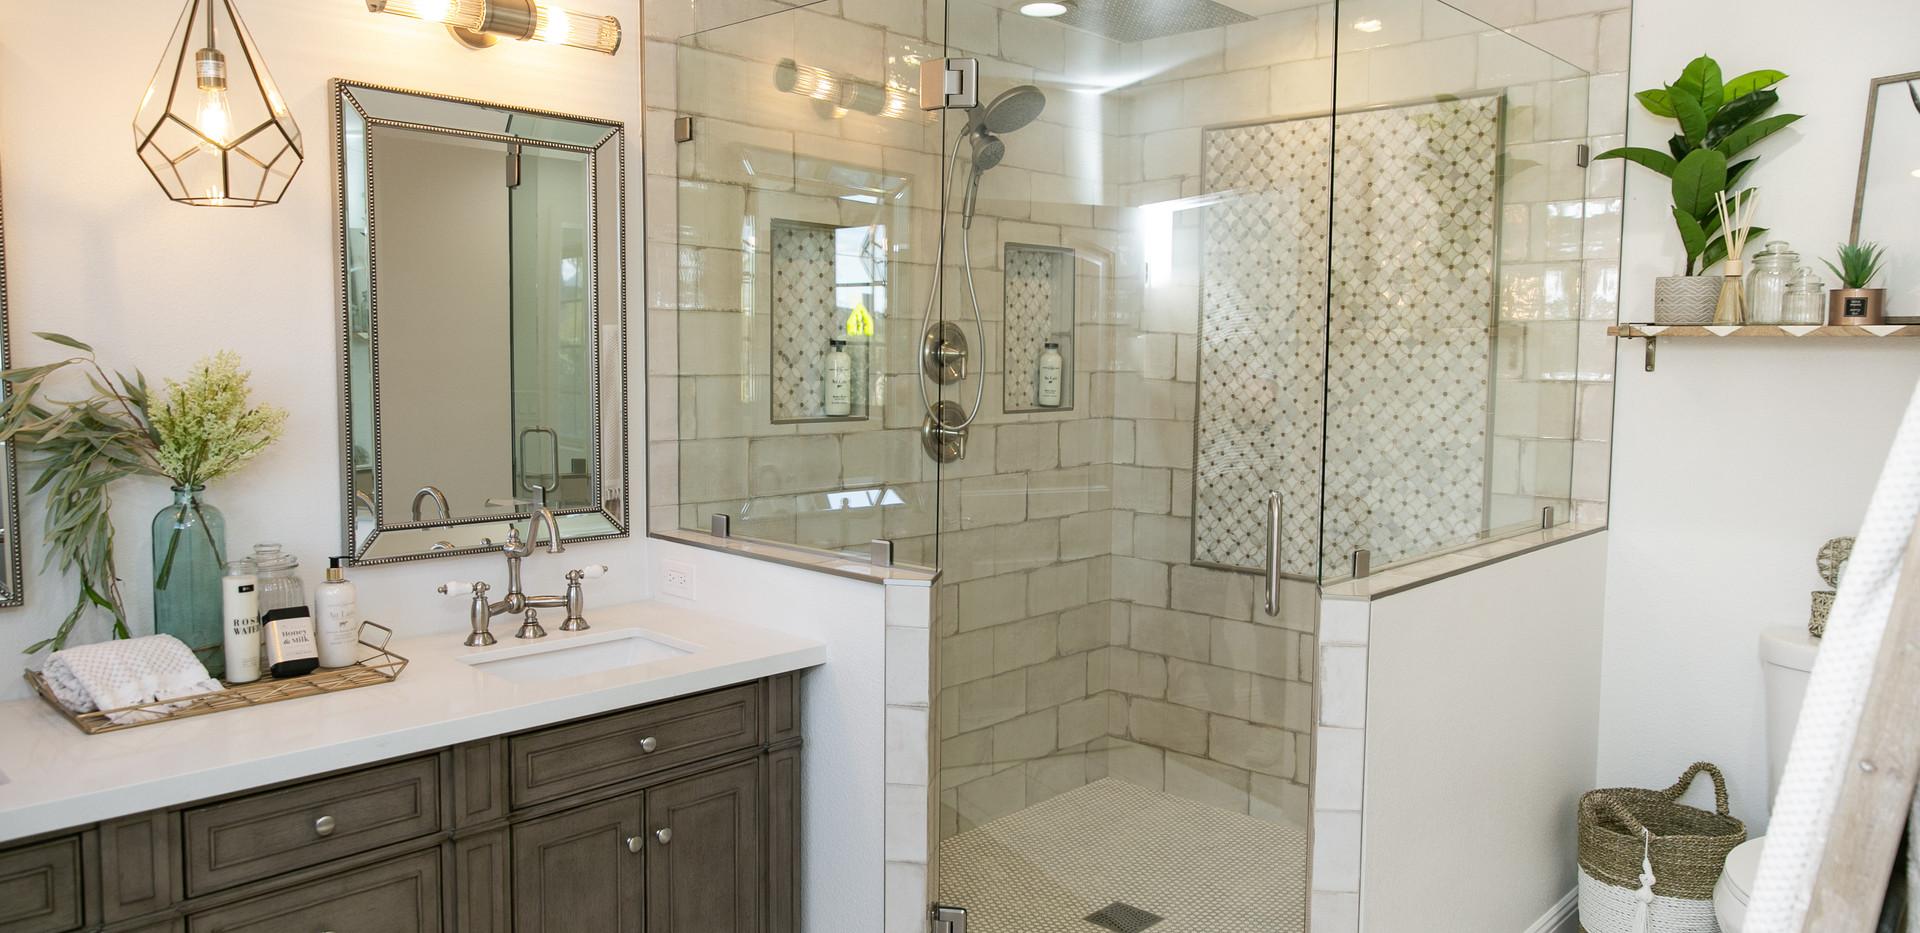 Massive Walk-in Shower